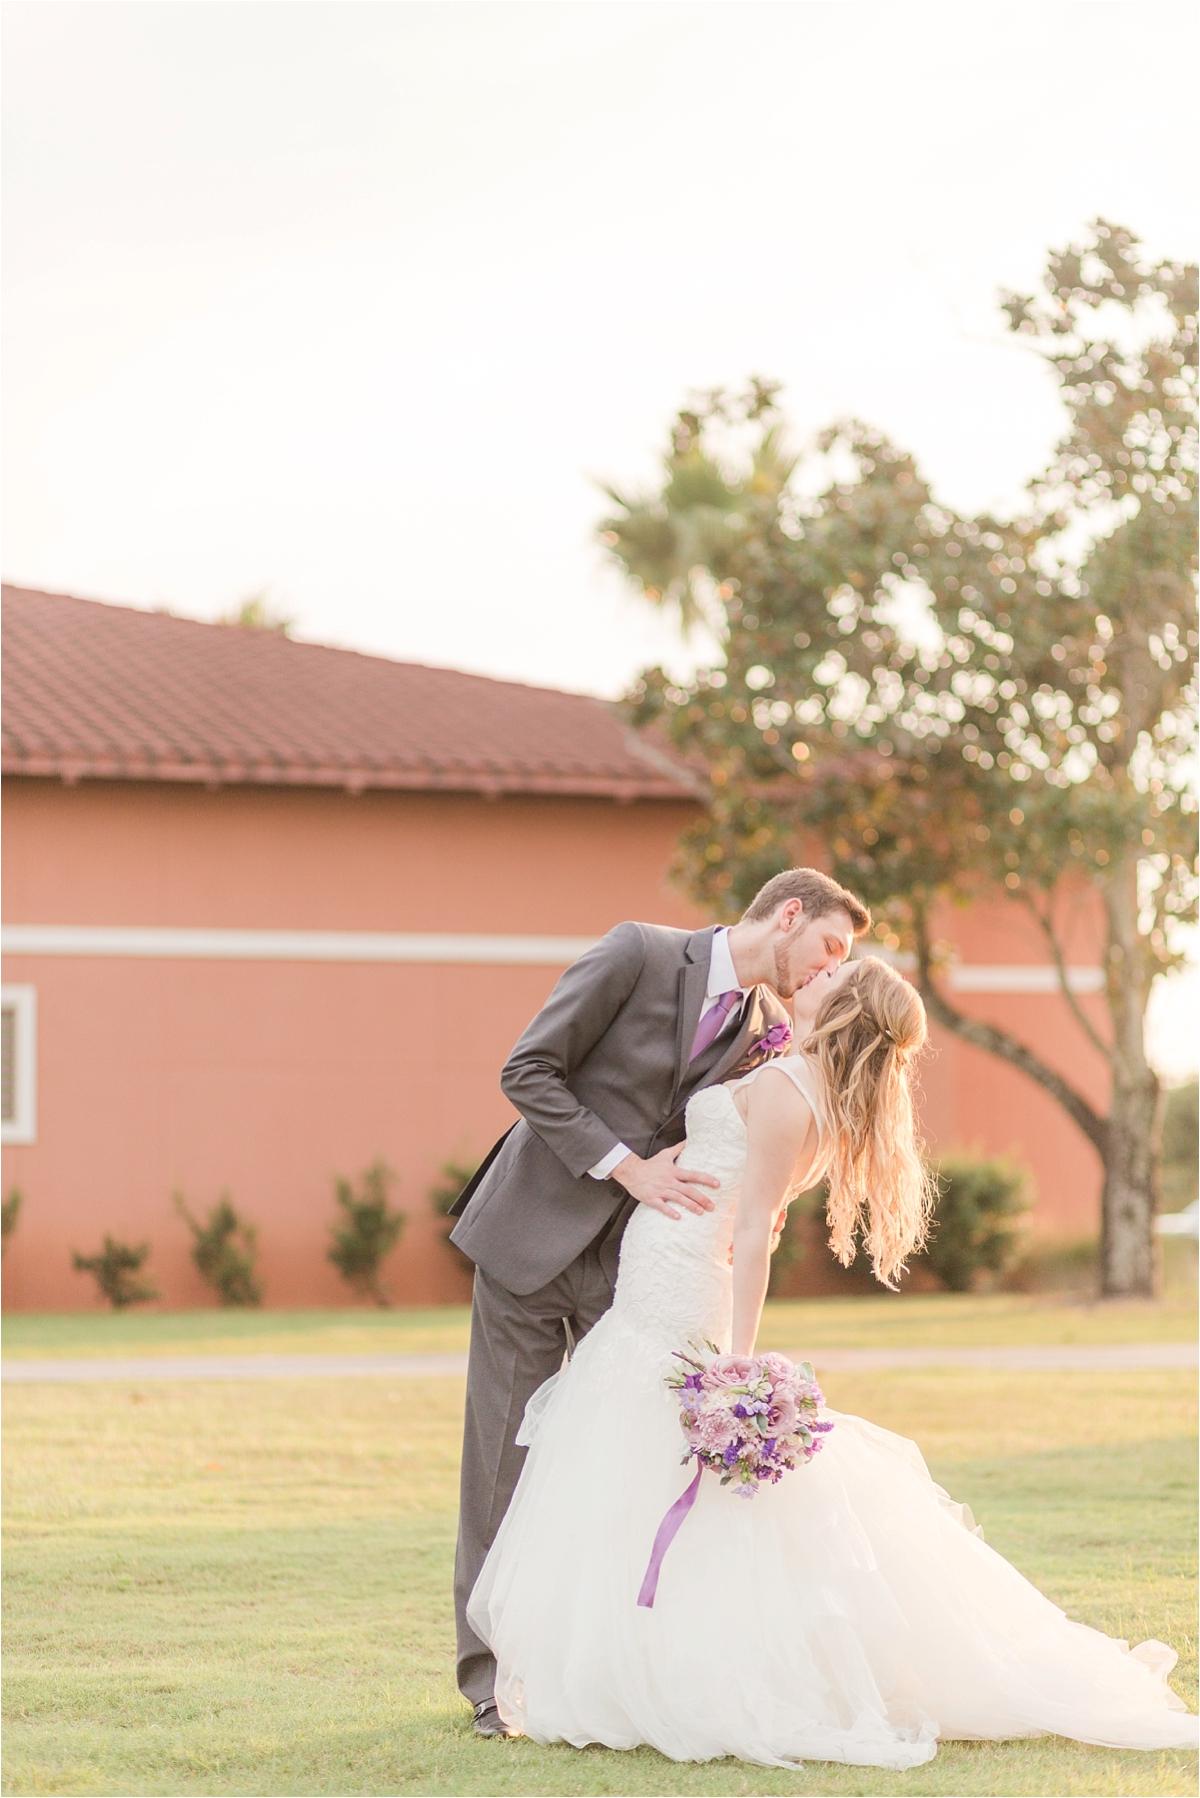 bride-groom-photos-portraits-alabama-wedding-photographer-dipping-kiss